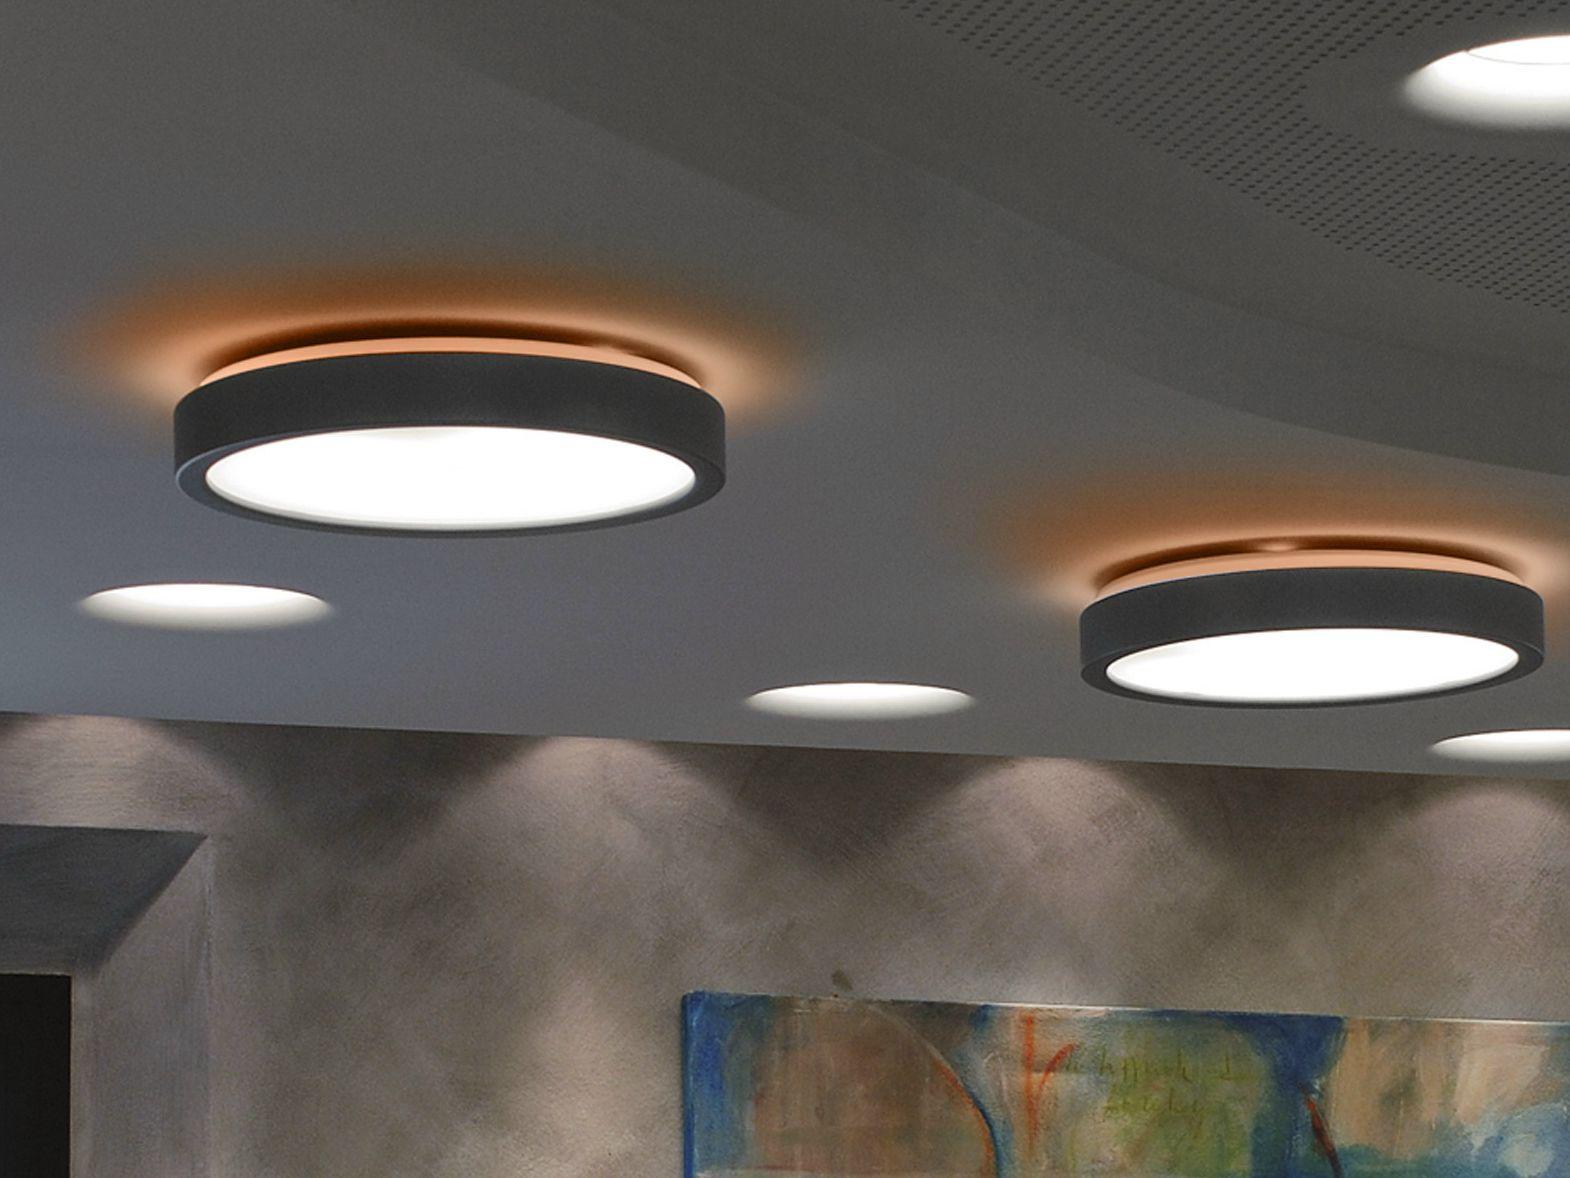 Fluorescent aluminium ceiling lamp Luna Collection by Martinelli Luce | design Emiliana Martinelli